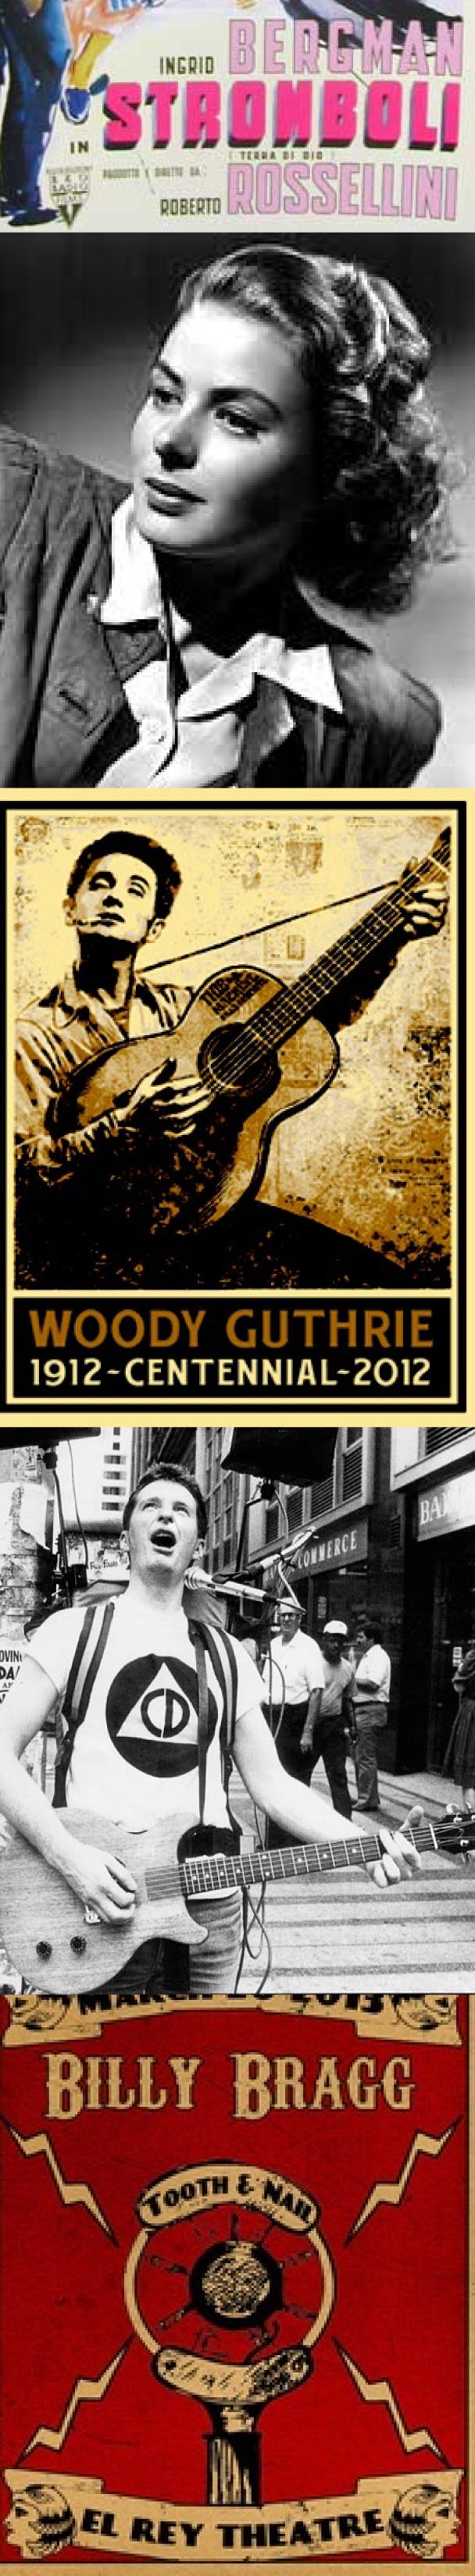 Ingrid Bergman -  Woody Guthrie & Billy Bragg -  http://www.youtube.com/watch?v=hxurhF7ssq0